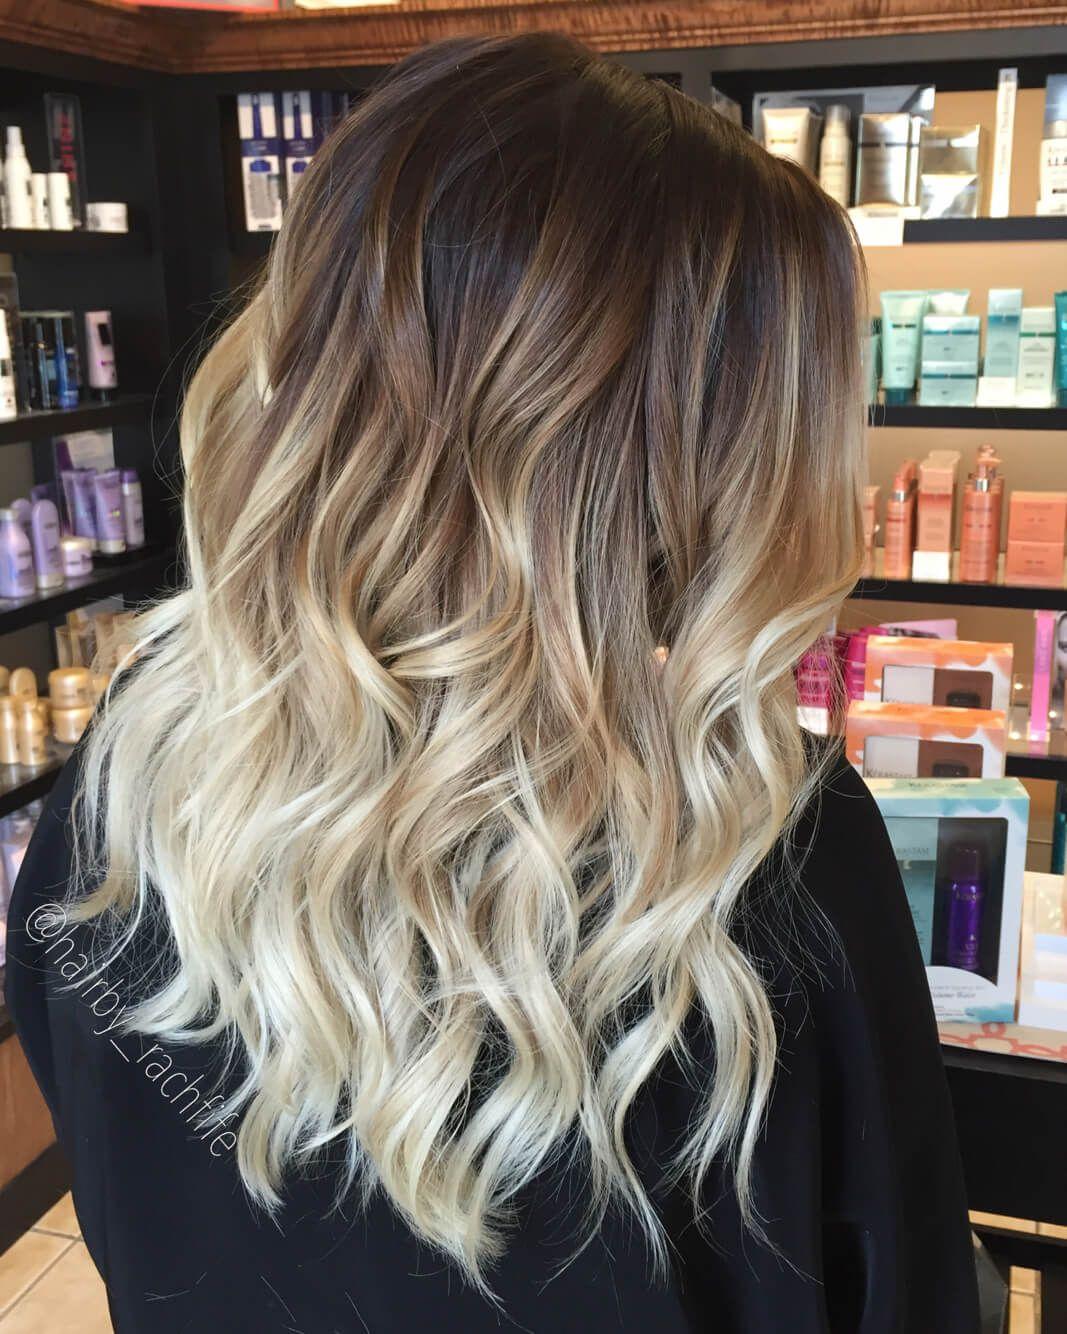 40 Blonde Ombre Hair Color Ideas In 2018 Cabello Rubio Tintes De Cabello Color De Cabello